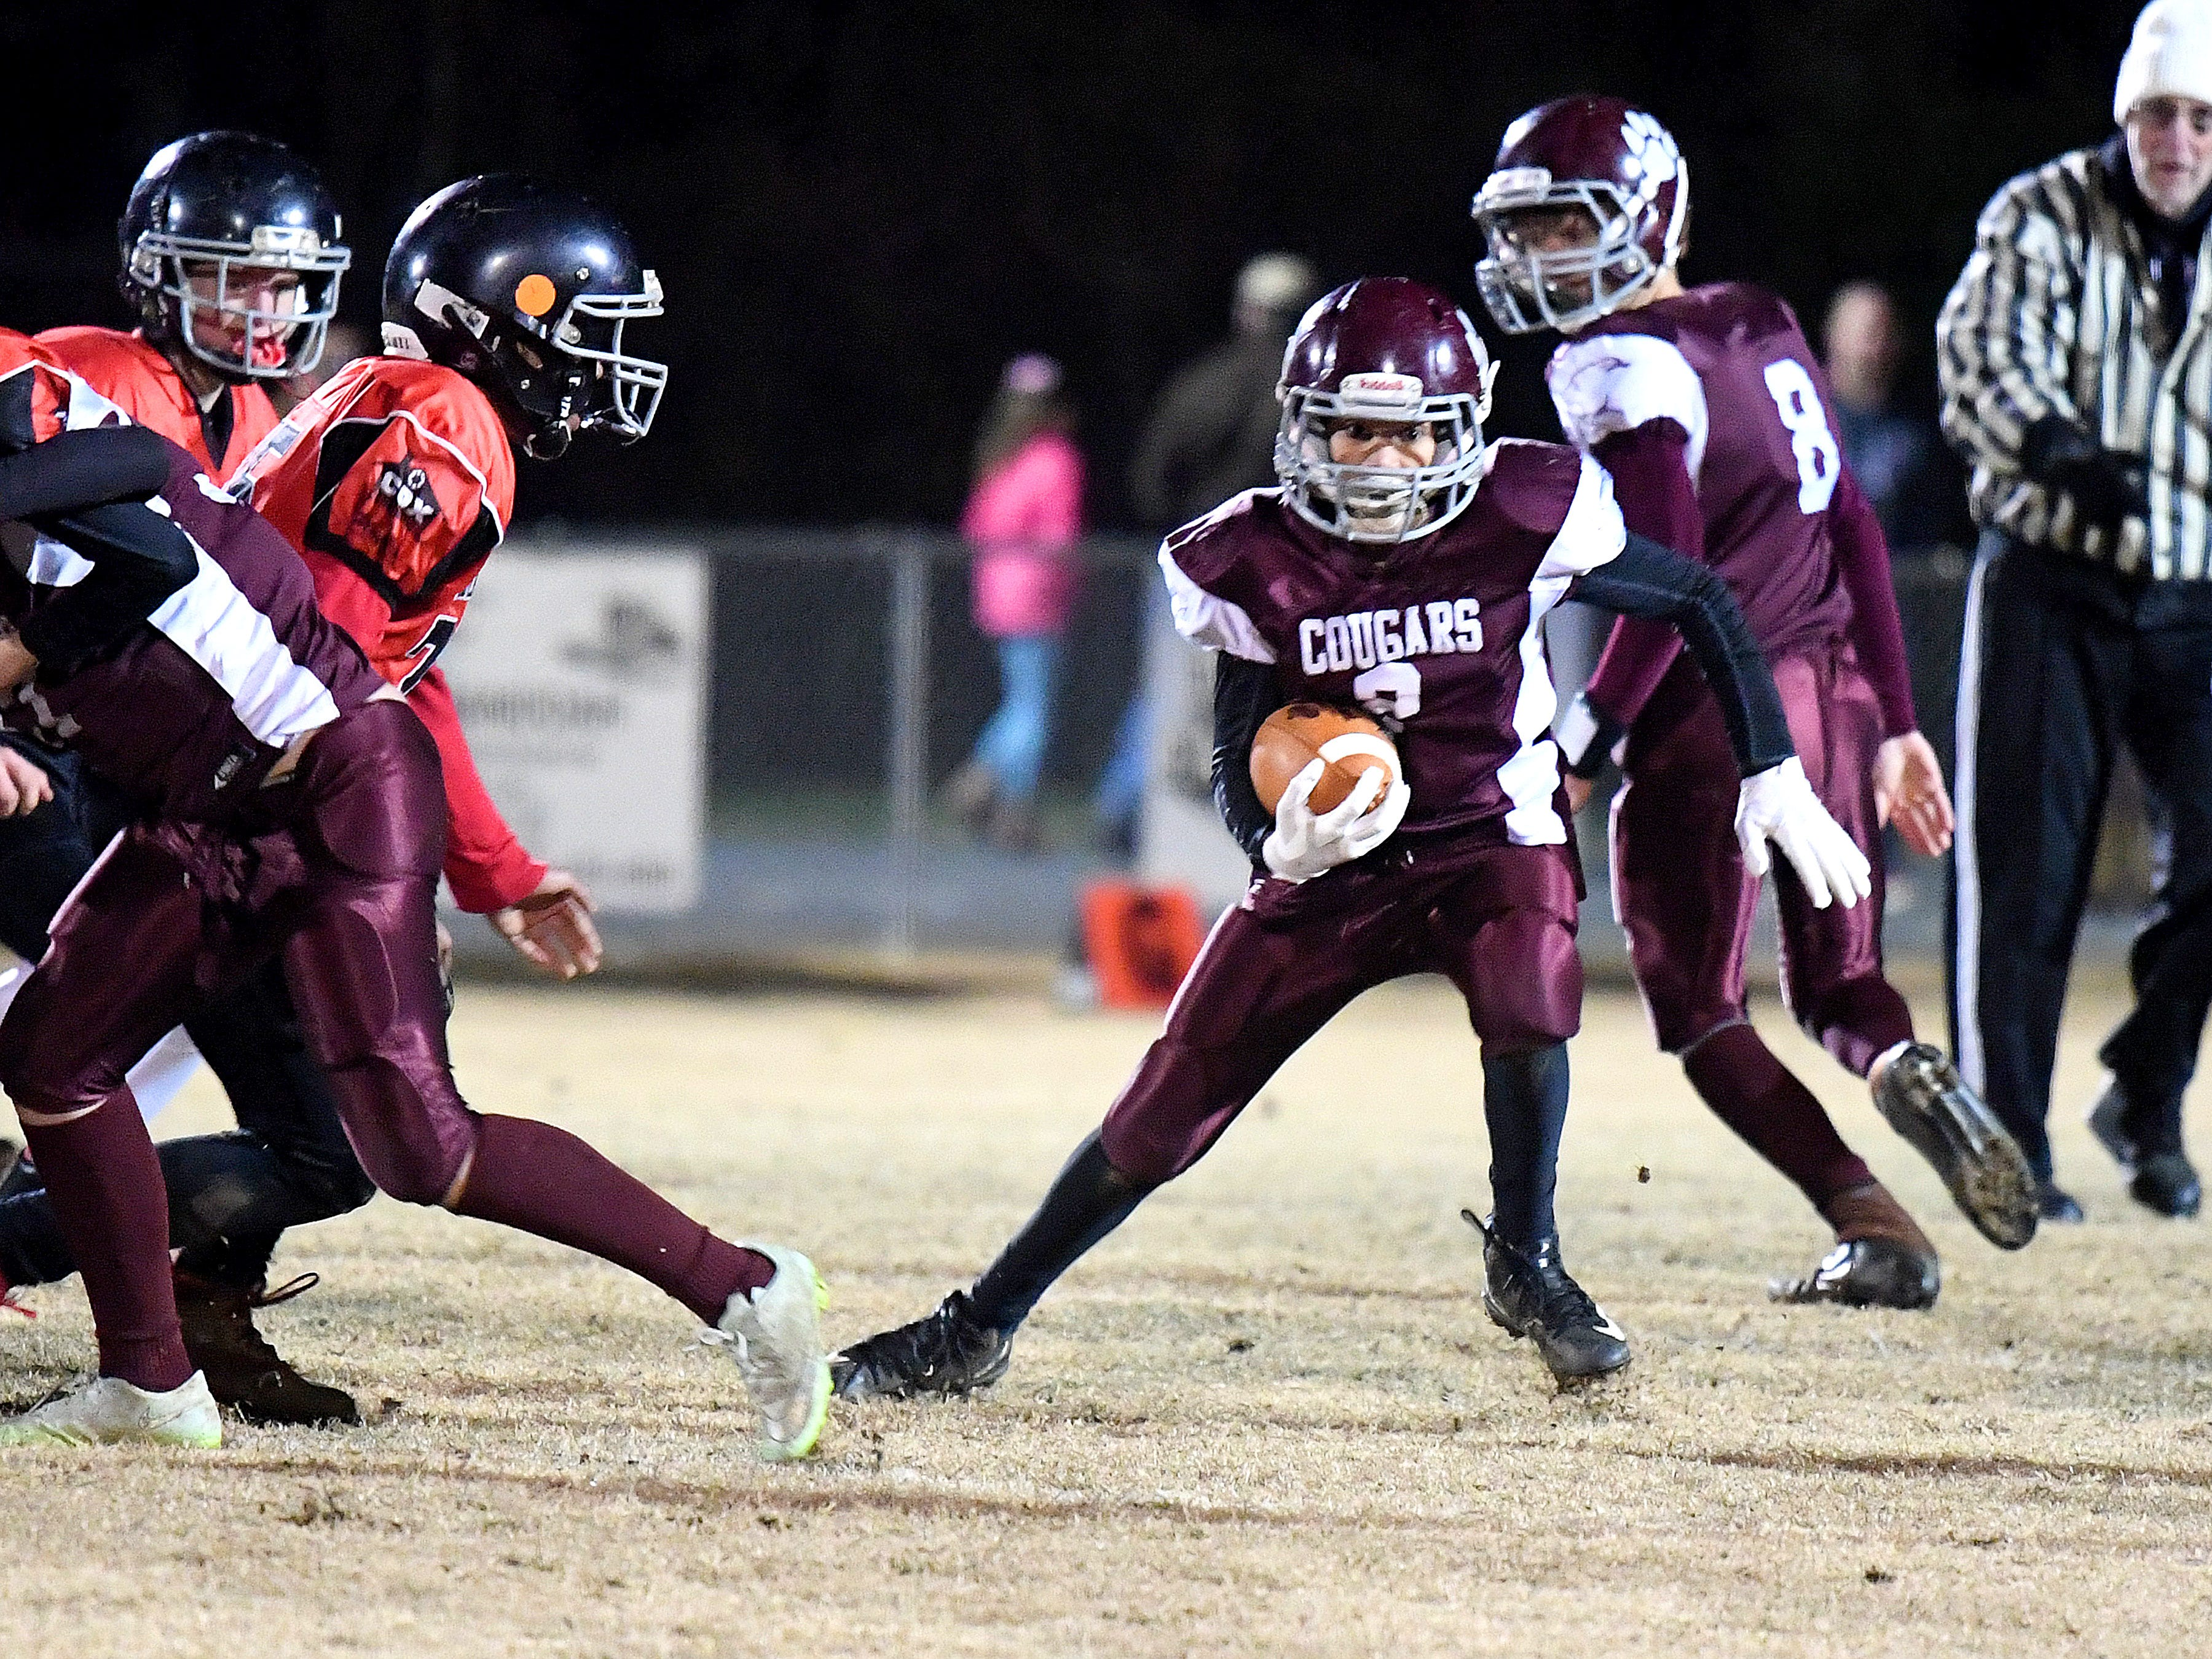 Stuarts Draft's Andre Ellis runs the football during the Augusta County Quarterback Club Seniors Super Bowl in Fishersville on Sunday, Nov. 11, 2018.  RIverheads defeats Stuarts Draft, 38-6.